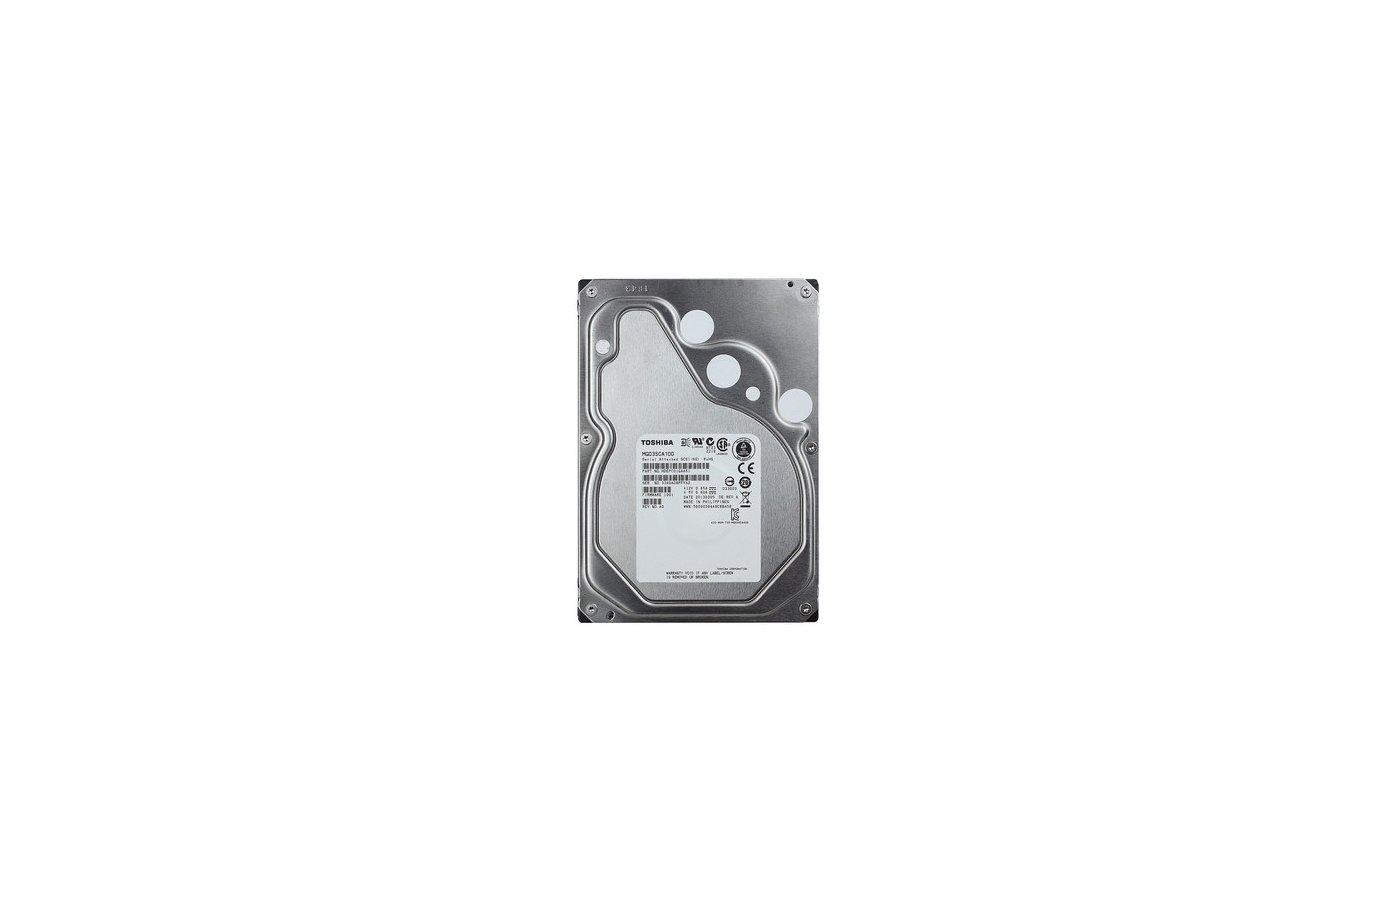 Жесткий диск Toshiba SAS-2 1Tb MG03SCA100 7200 rpm 64Mb